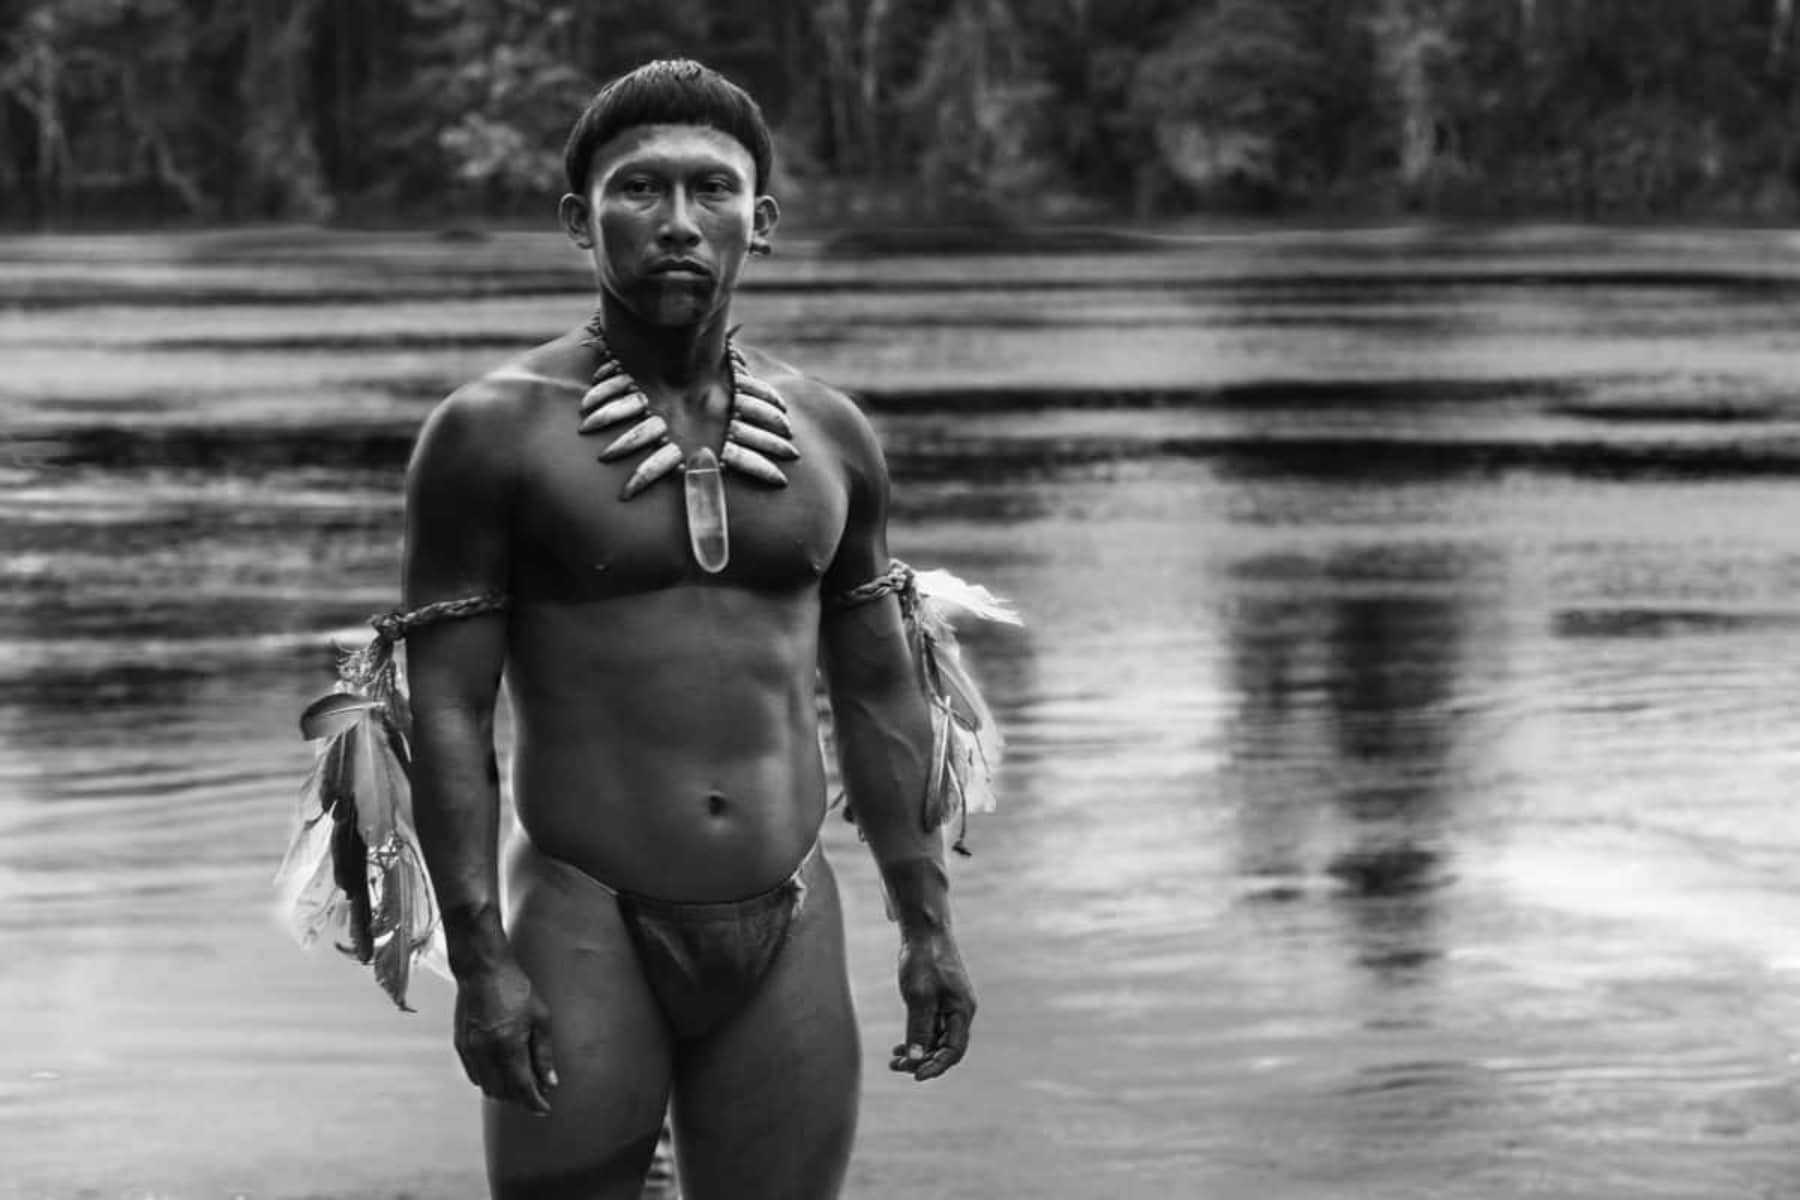 'El Abrazo de la Serpiente' with Colombian Heart, Darkness and Two River Voyages